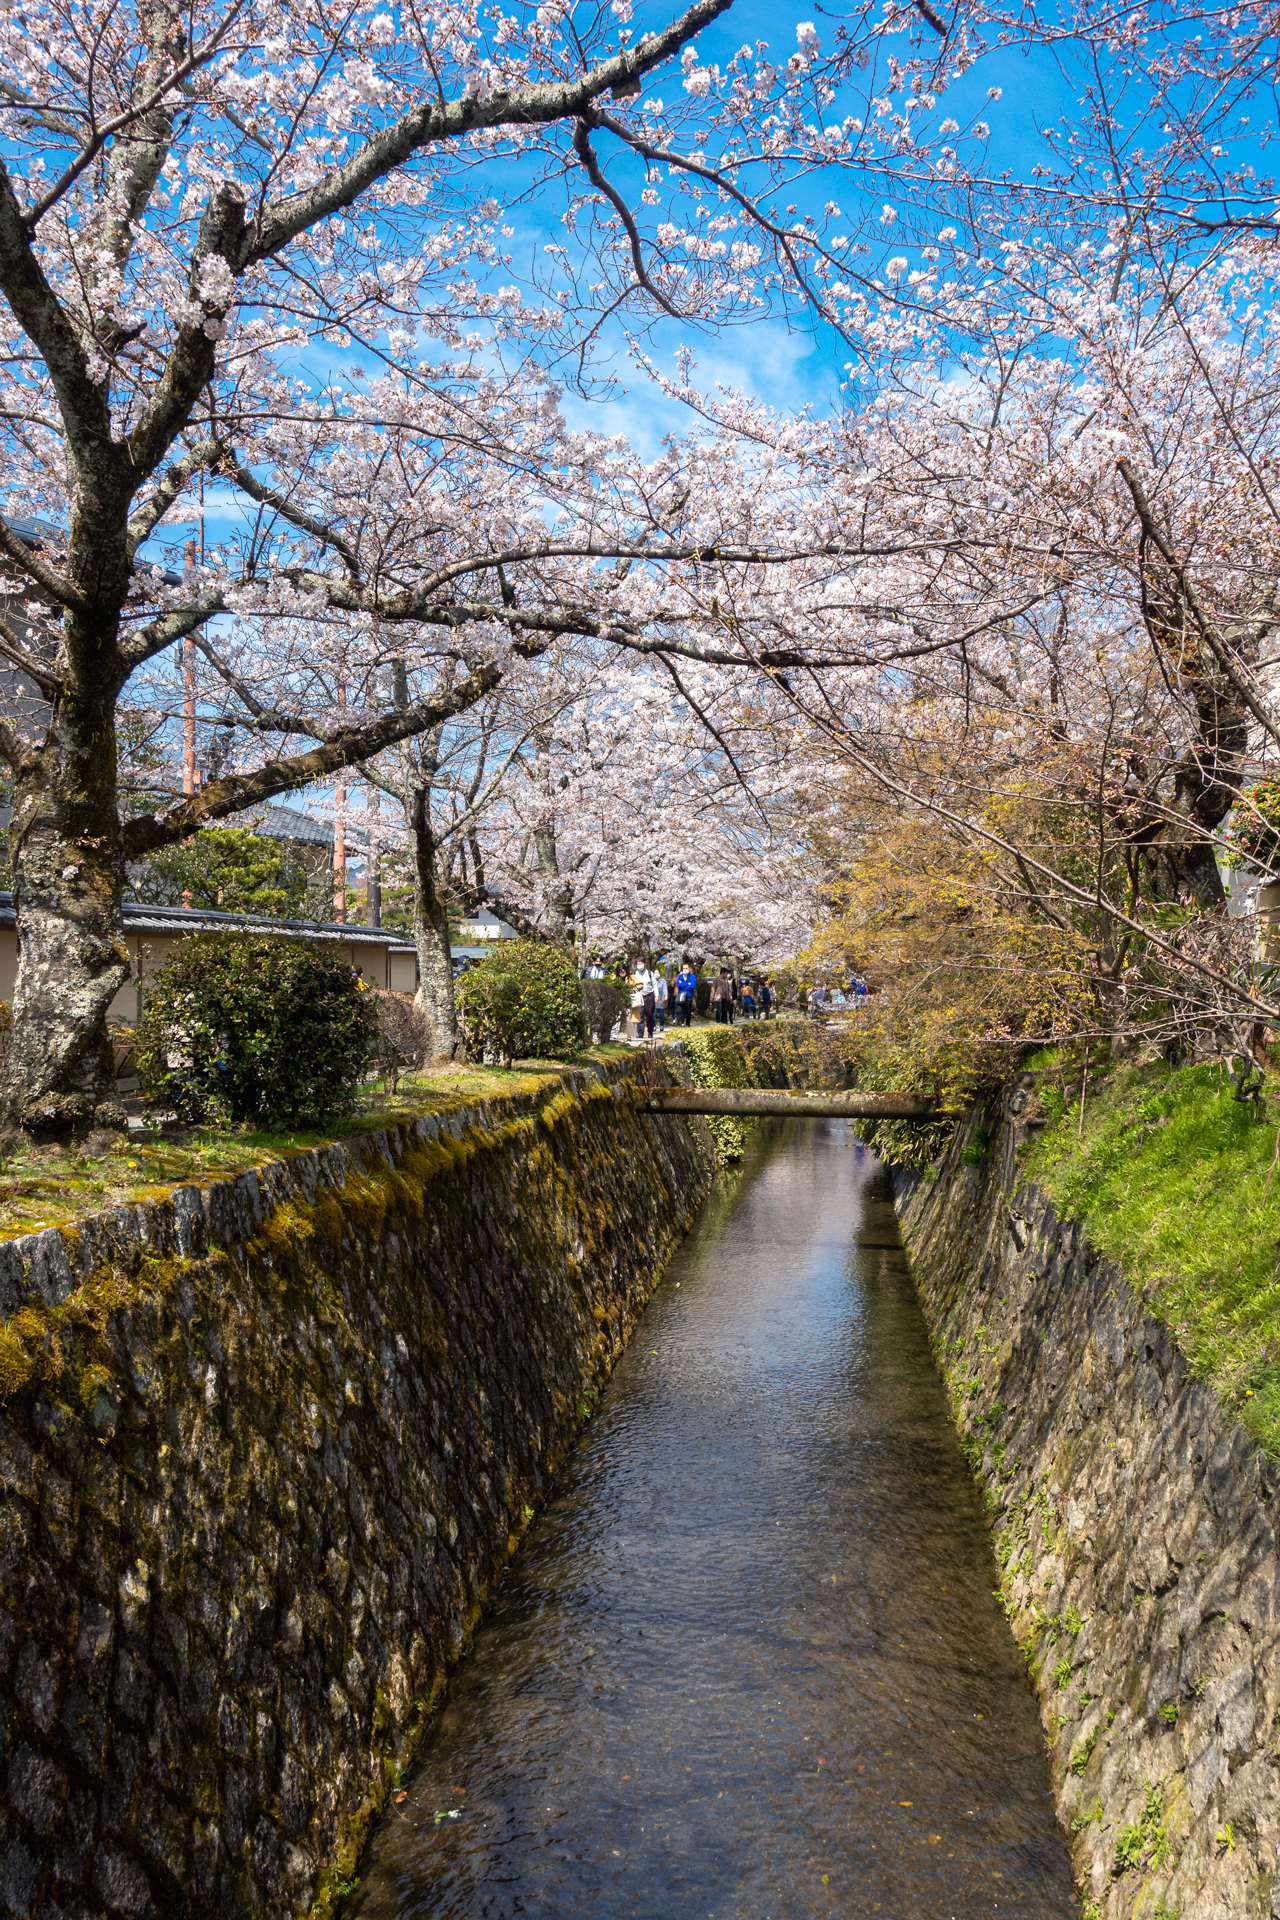 DSC04829 京都府 哲学の道(疎水沿いに咲く桜の並木道が美しい春におすすめ写真スポット! 写真の紹介、アクセス情報など)